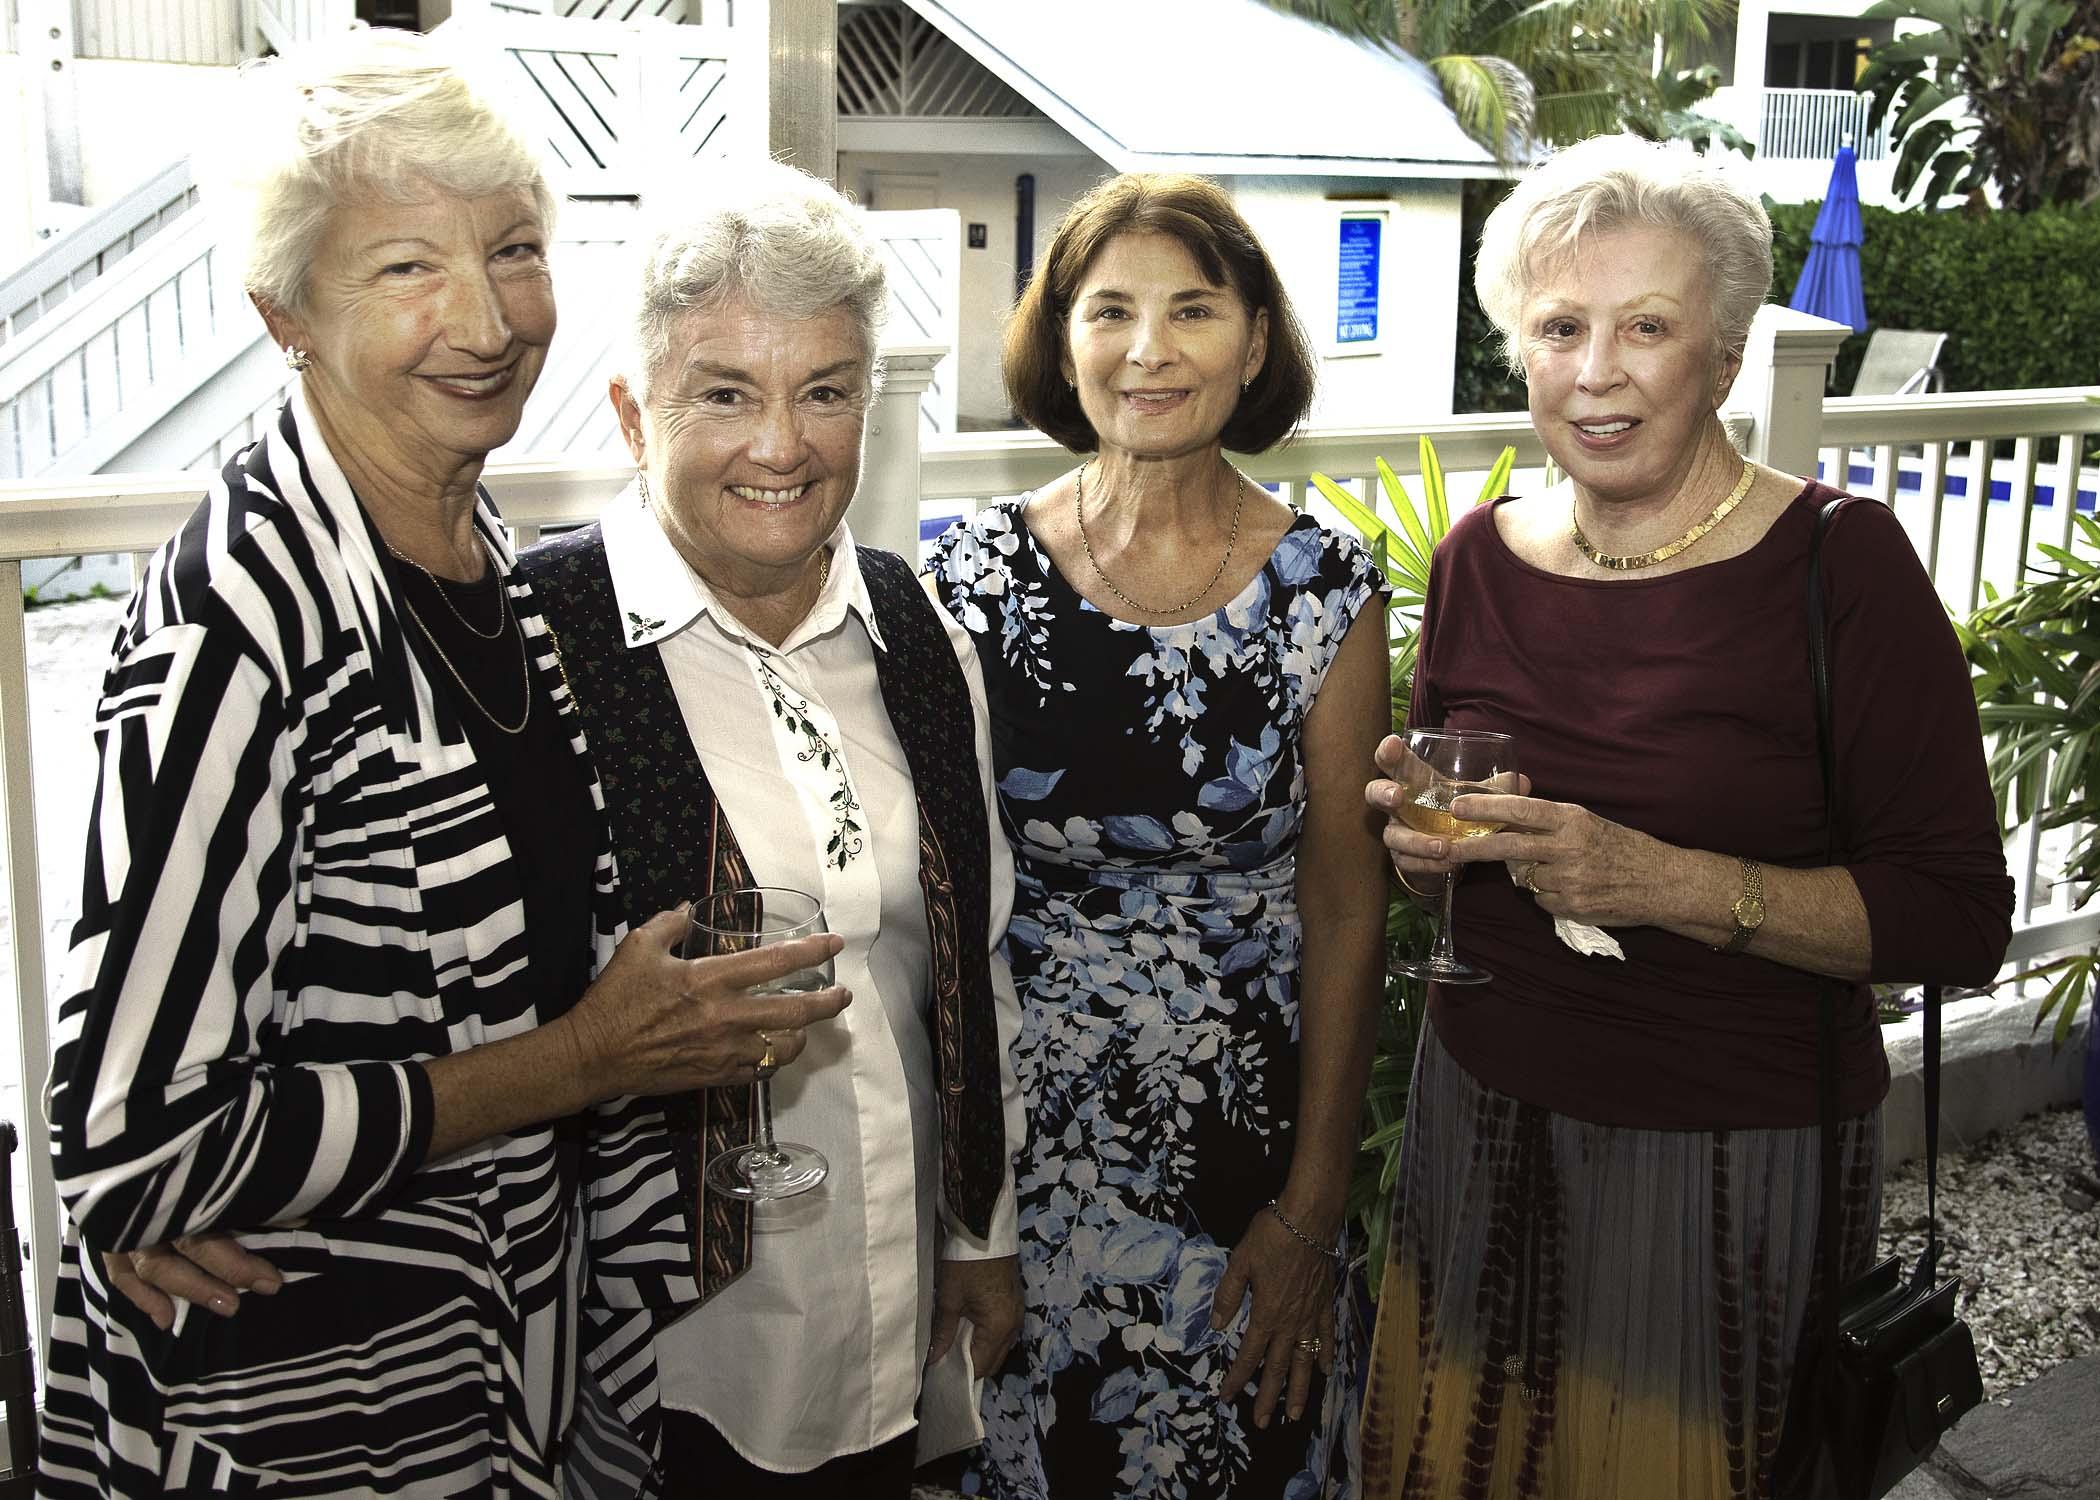 (L-R) Karen Sartoris, Lyn Kern, Irene Nolan, Patricia Macchia